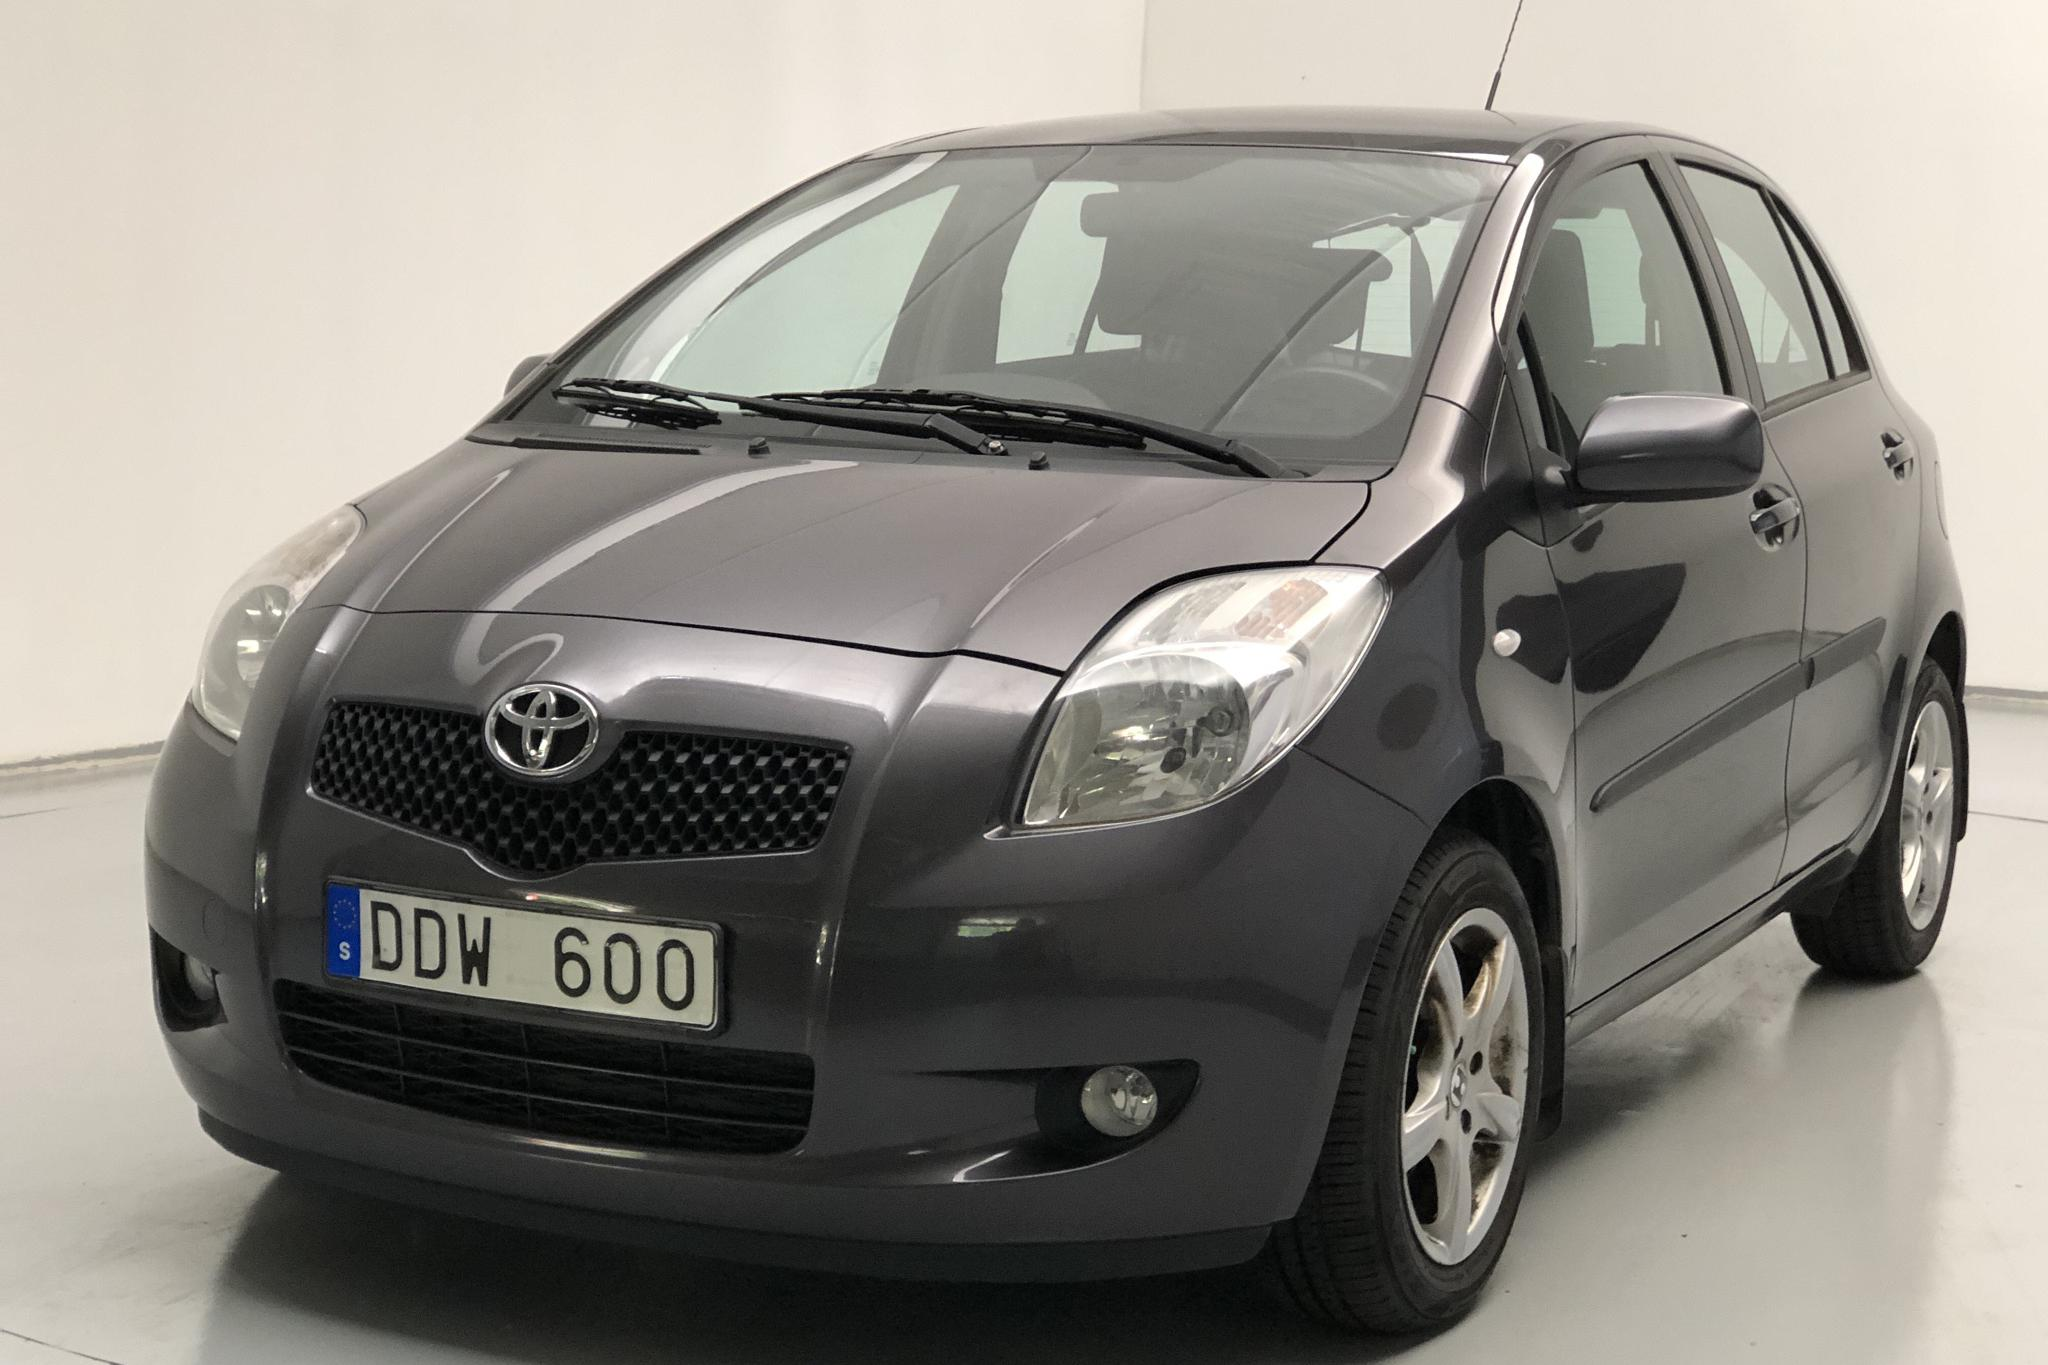 Toyota Yaris 1.3 5dr (87hk)